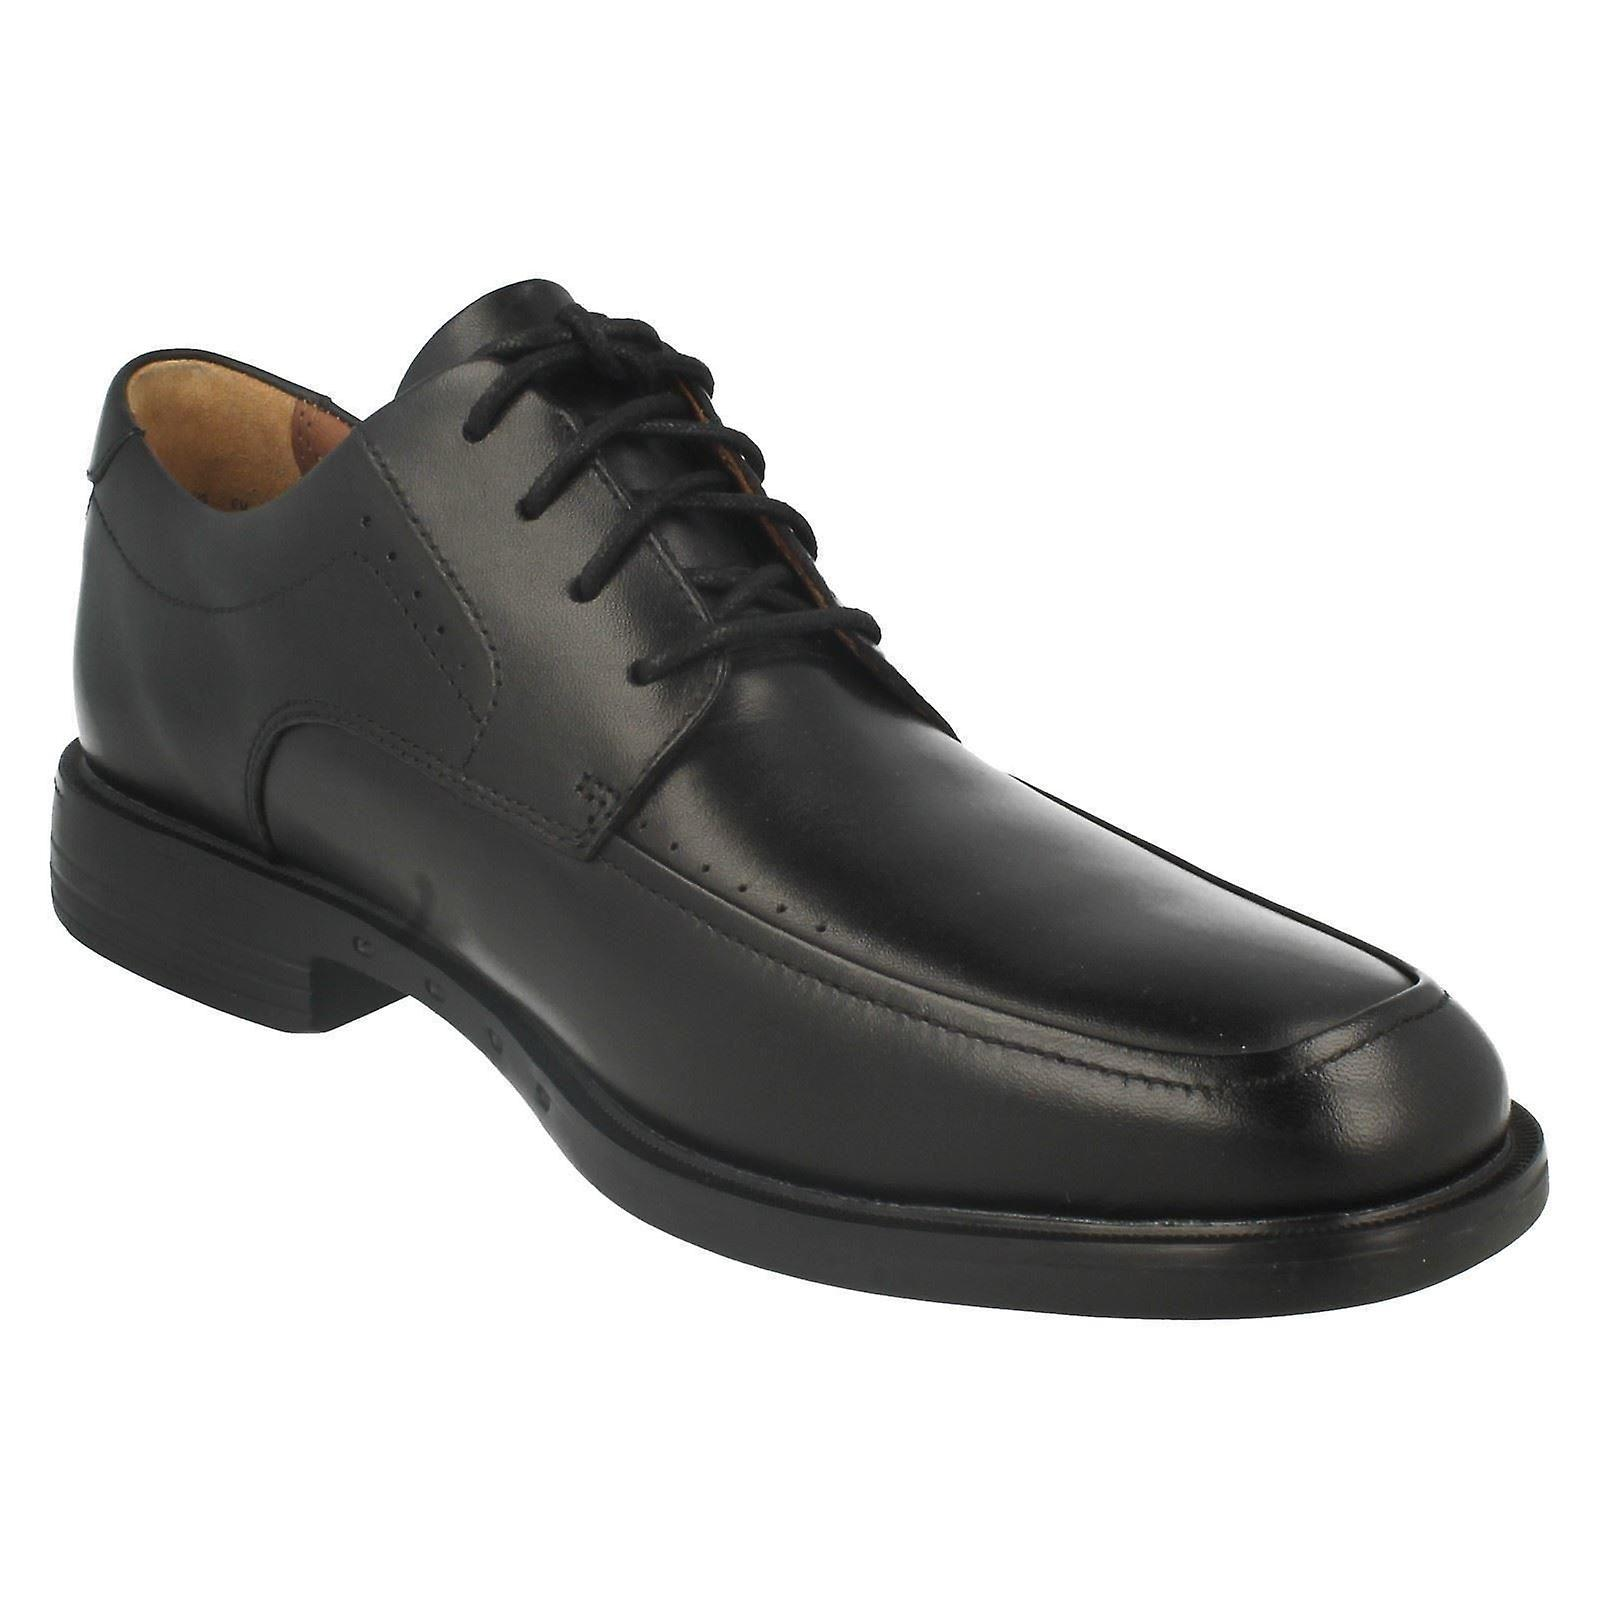 Shoes Clarks Unbizley View Unstructured Mens aPqx8n